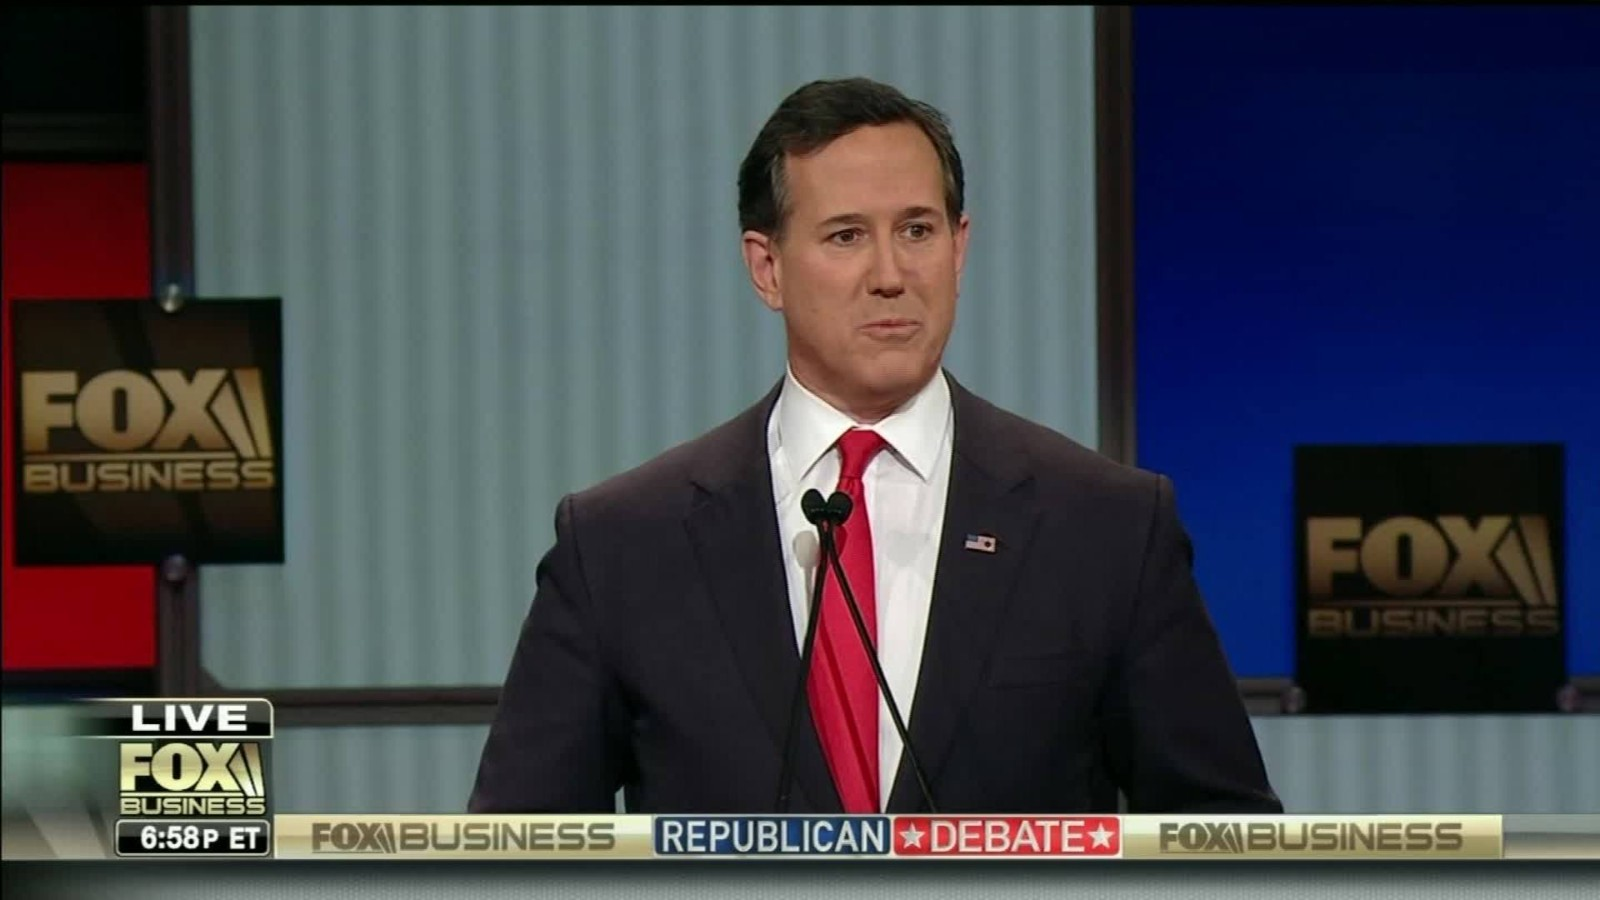 Rick Santorum: Go Google me - CNN Video